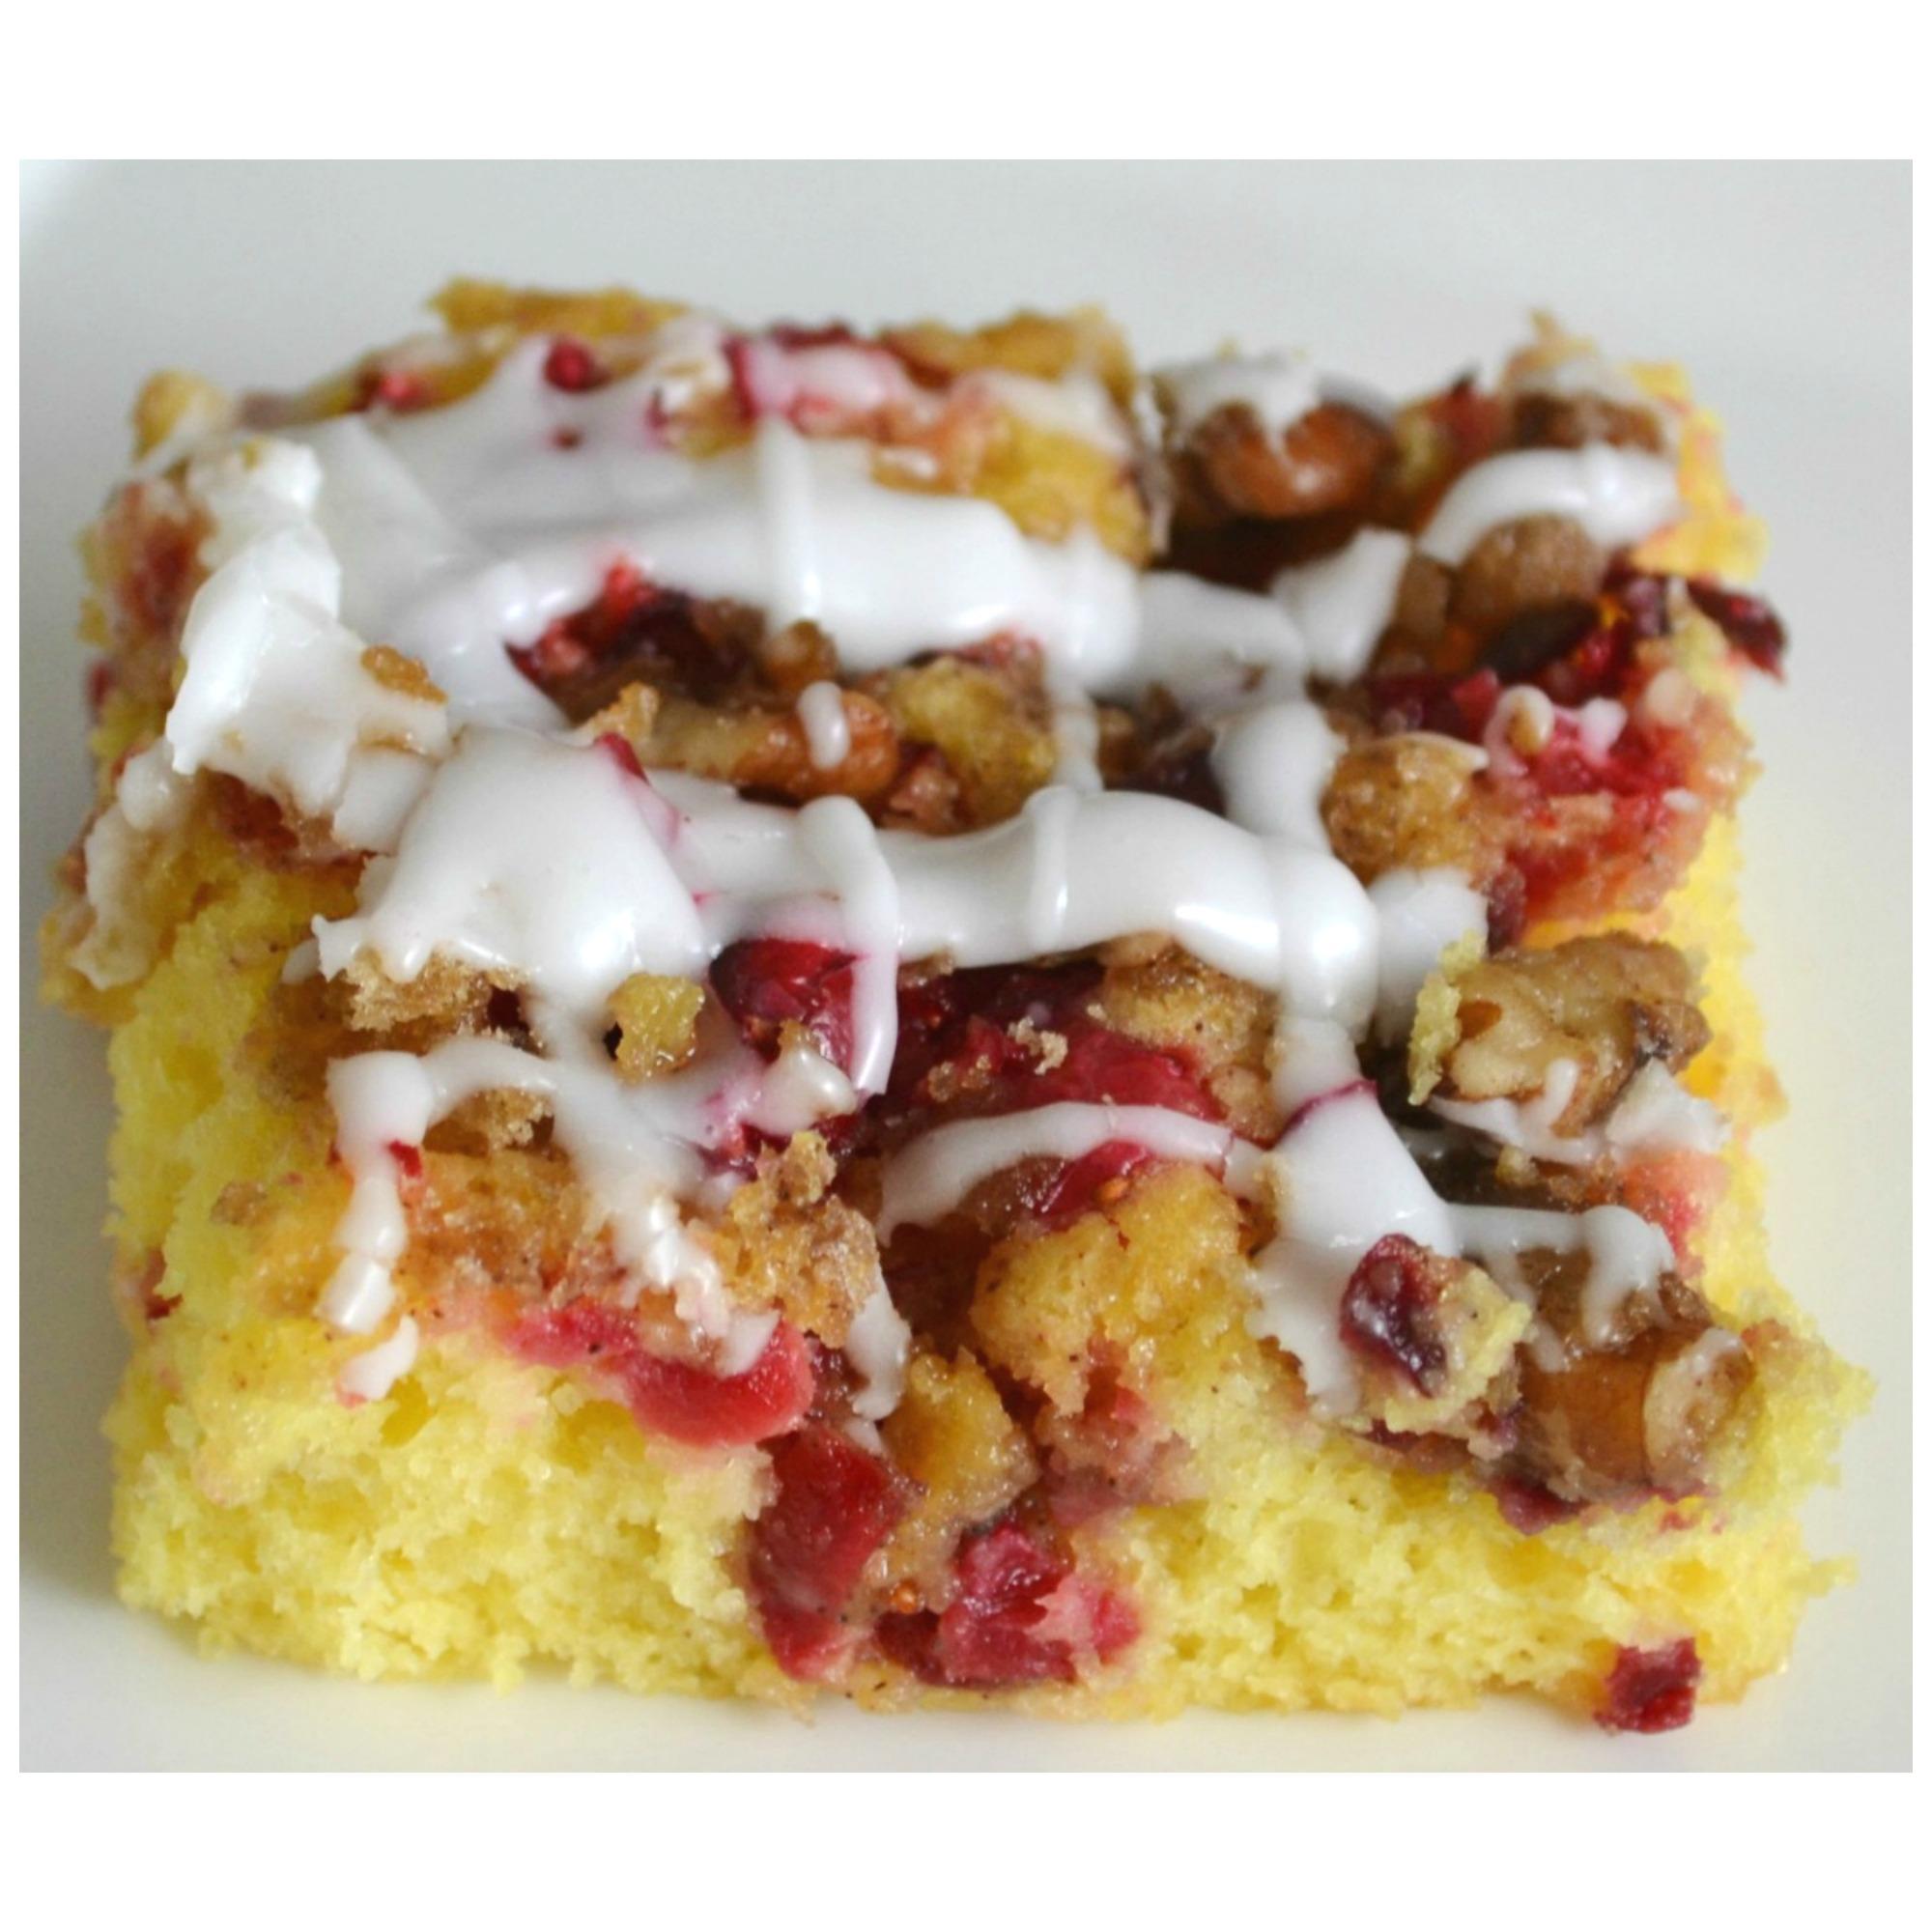 streusel-topped-cranberry-eggnog-cake-bars